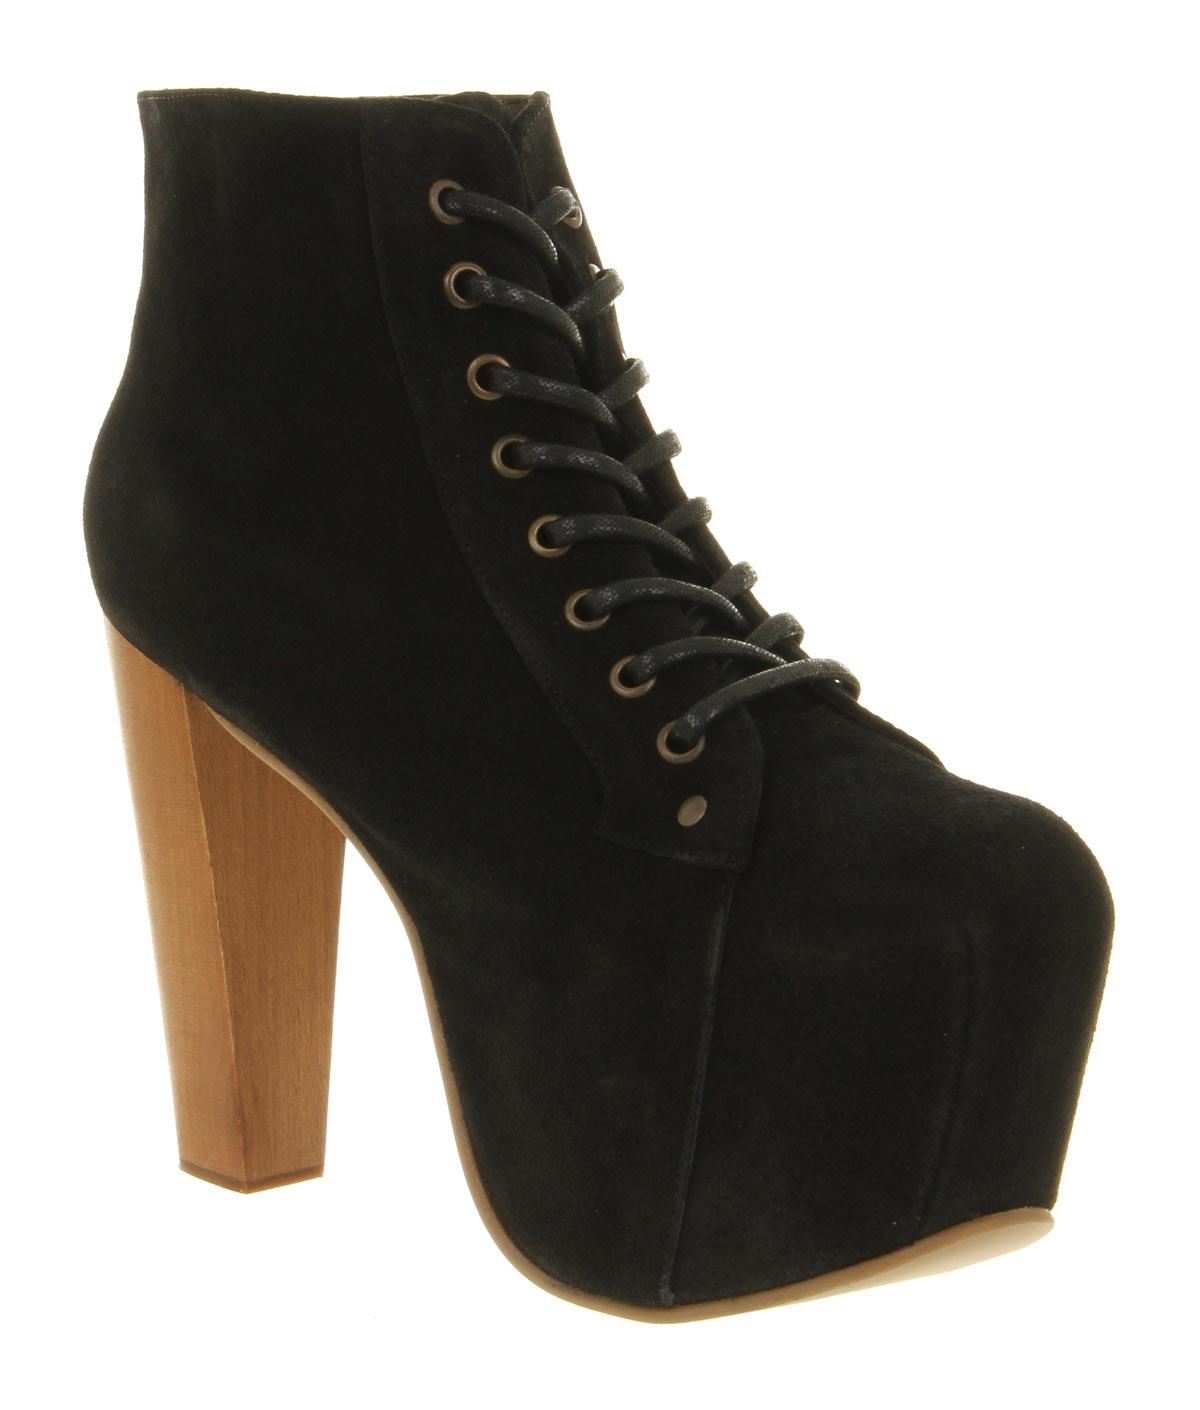 Womens jeffrey campbell lita platform ankle boot black suede boots size 7 ebay - Jeffrey campbell lita platform boots ...